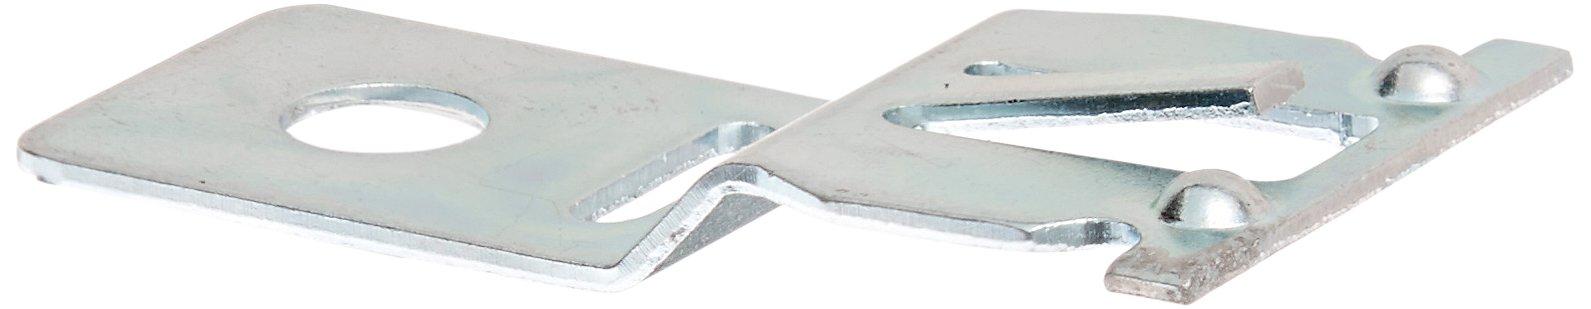 HELLA 931489001 Metal Bracket For 280 Relay - 100 Piece by HELLA